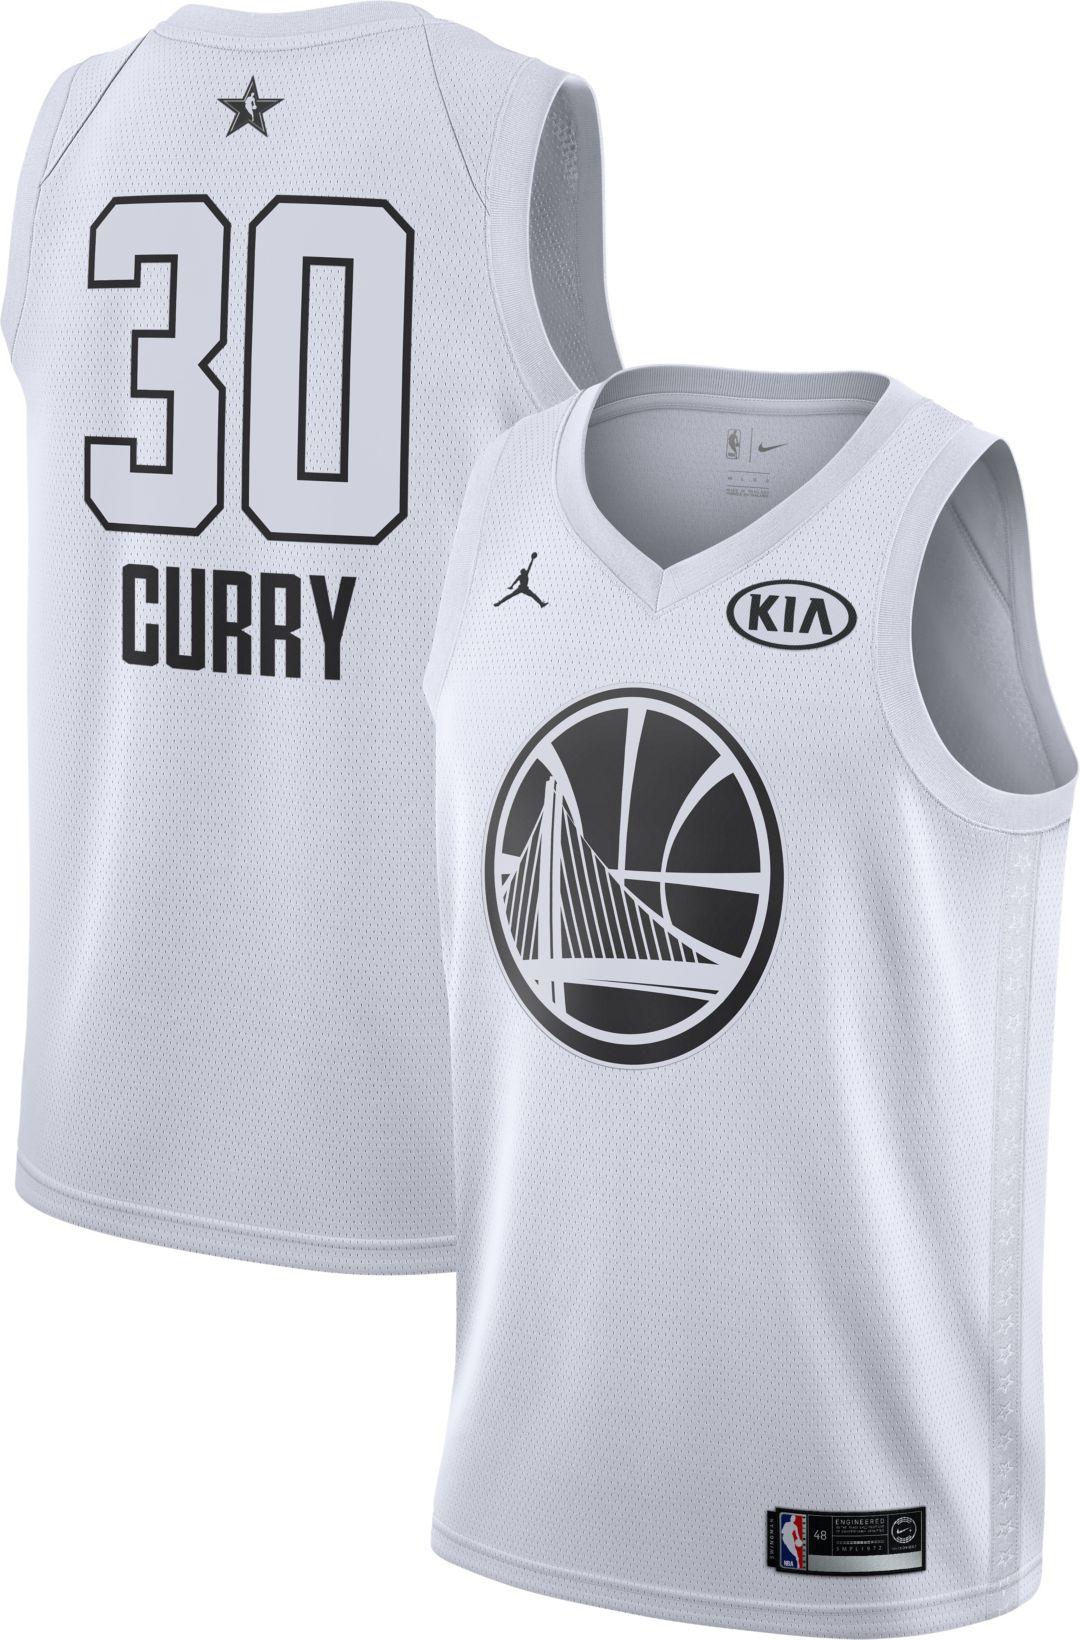 sale retailer 57bc9 ec731 Jordan Men s 2018 NBA All-Star Game Stephen Curry White Dri-FIT ...